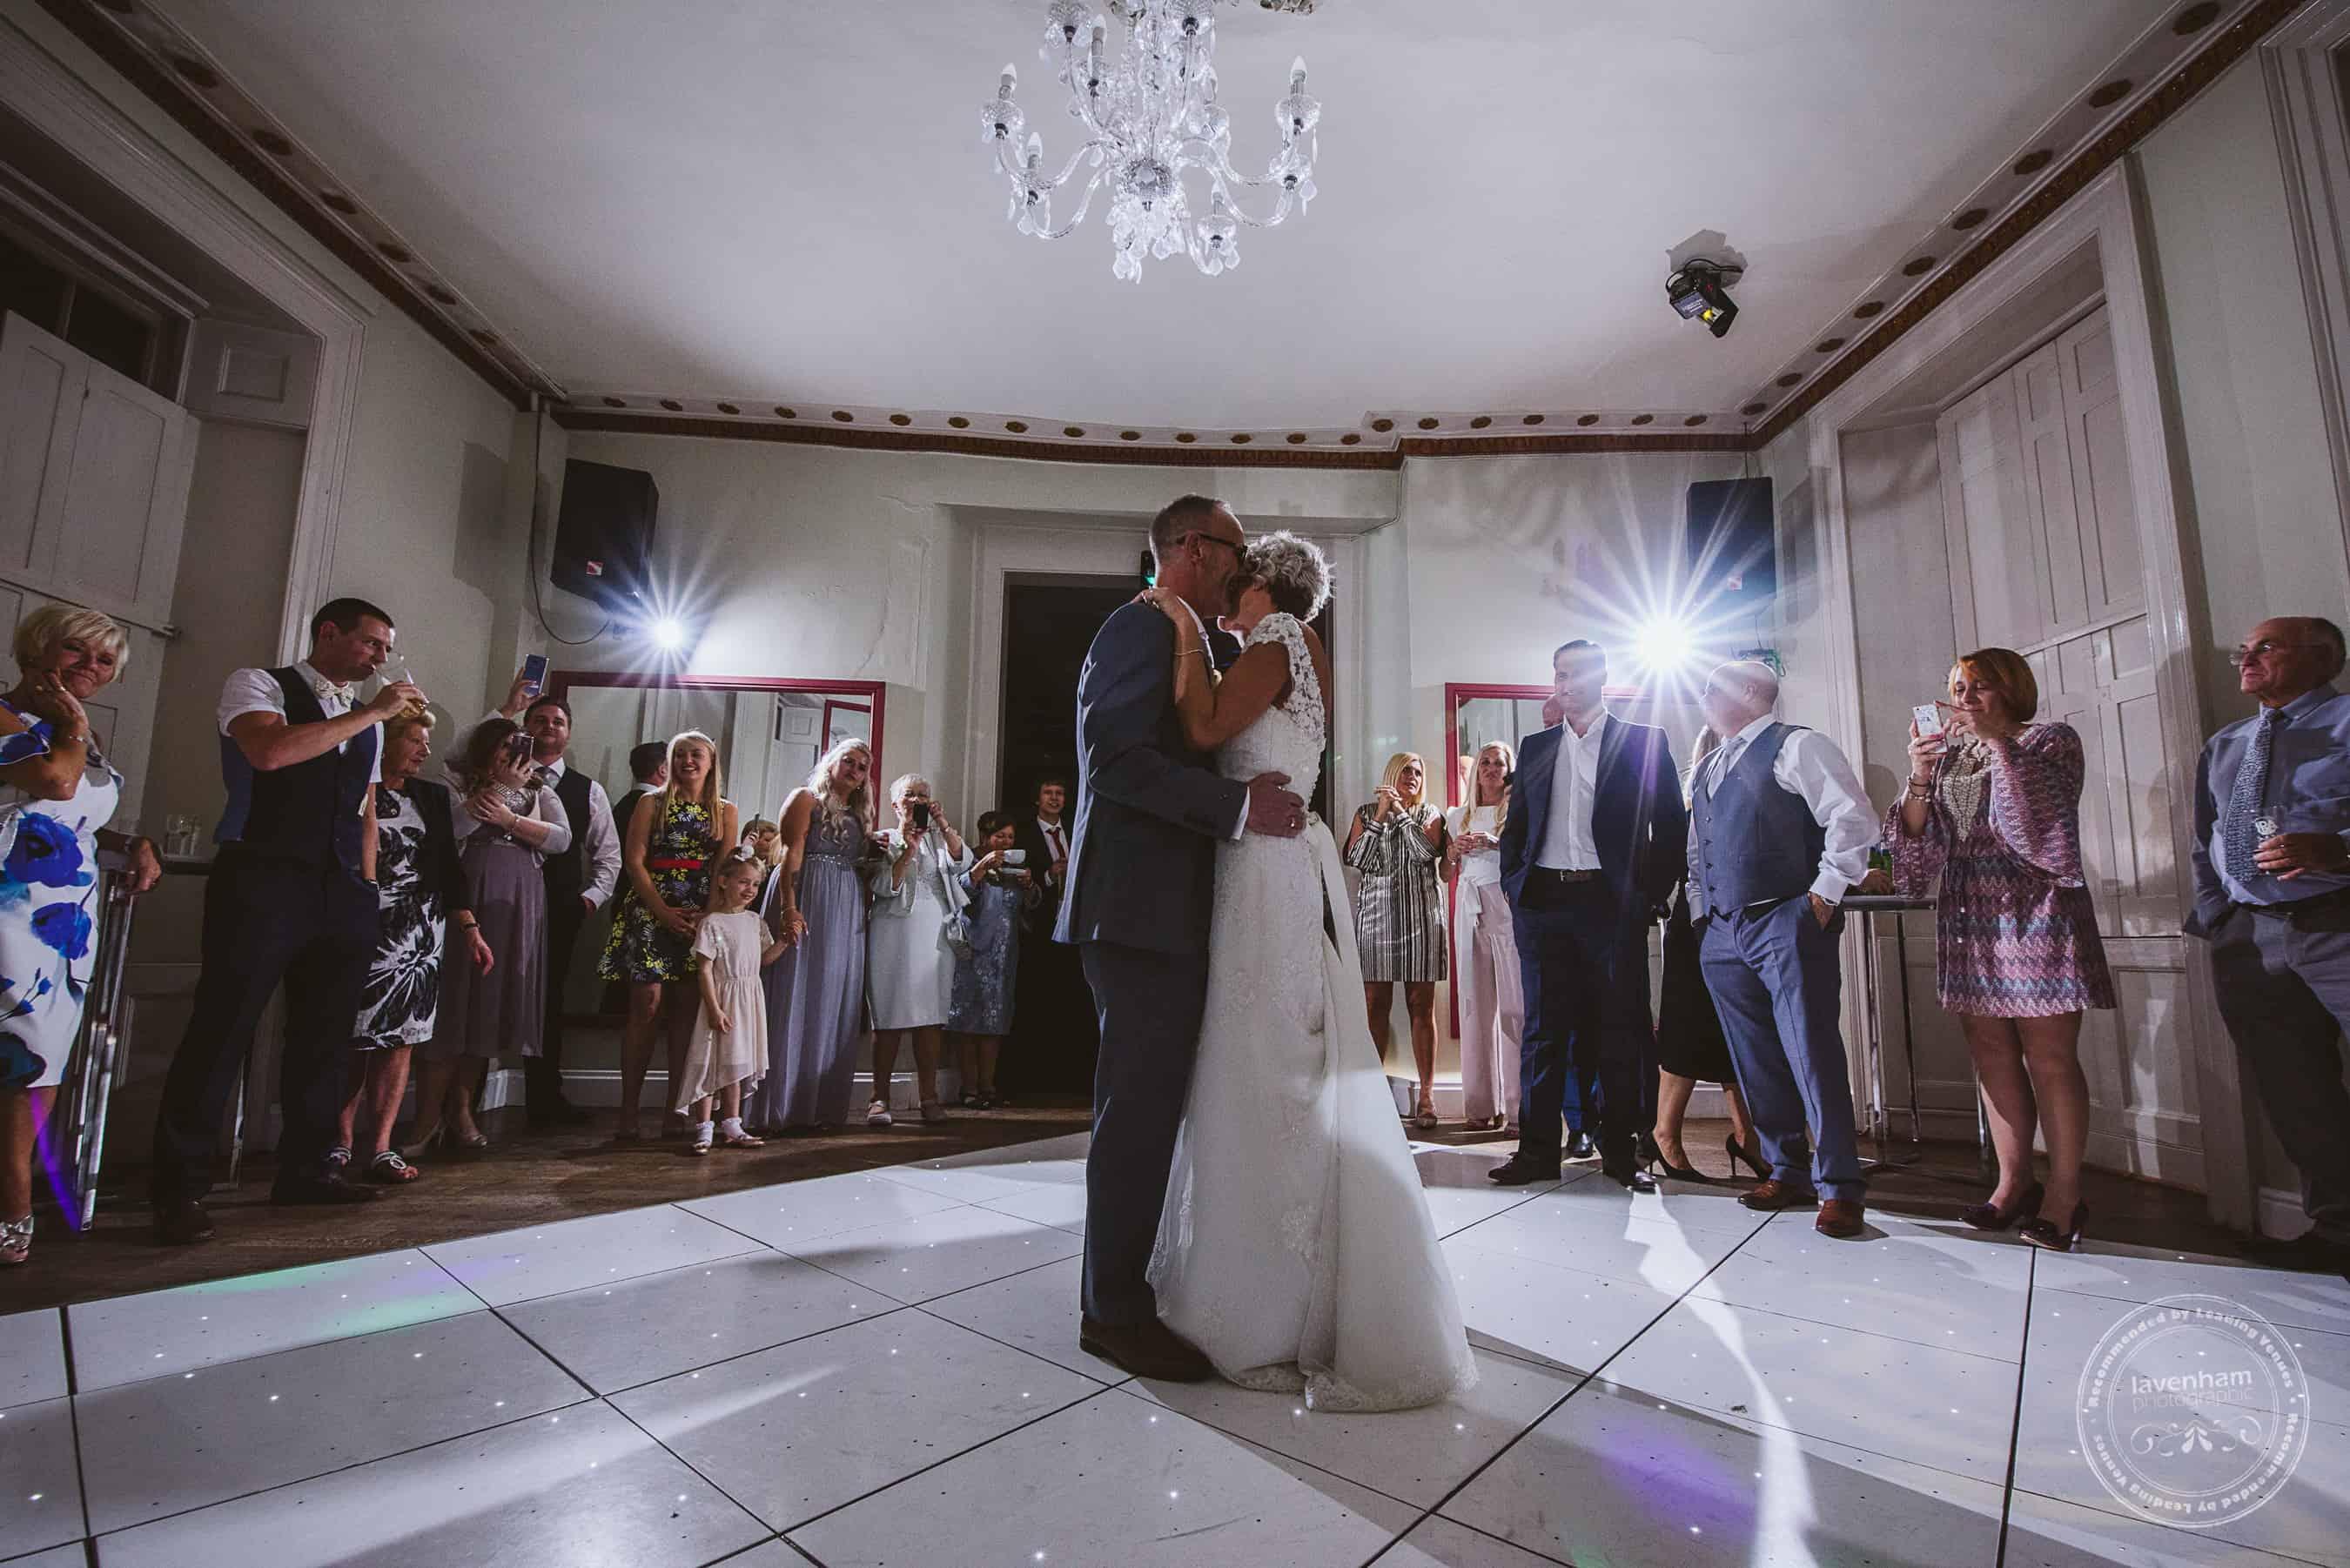 281018 Gosfield Hall Wedding Photography Lavenham Photographic 115